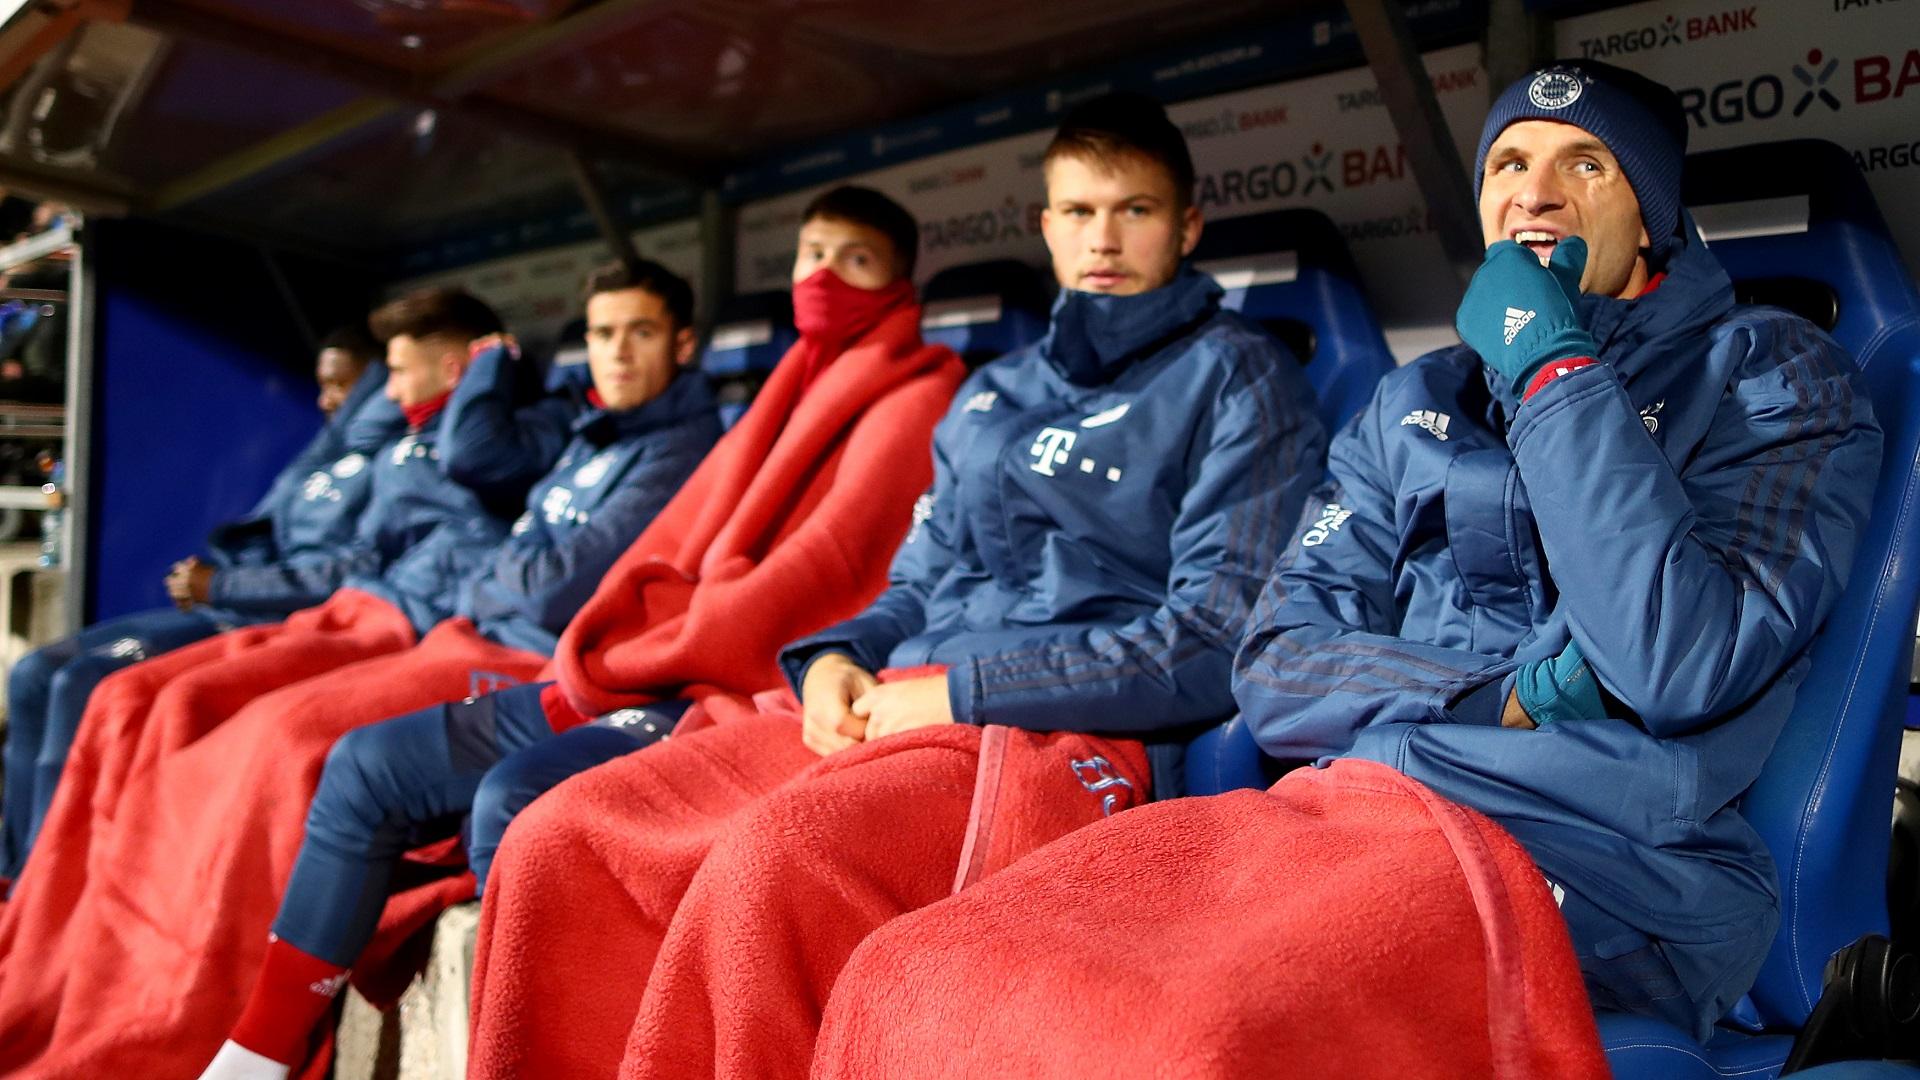 Thomas Muller Bayern Munich bench 2019-20